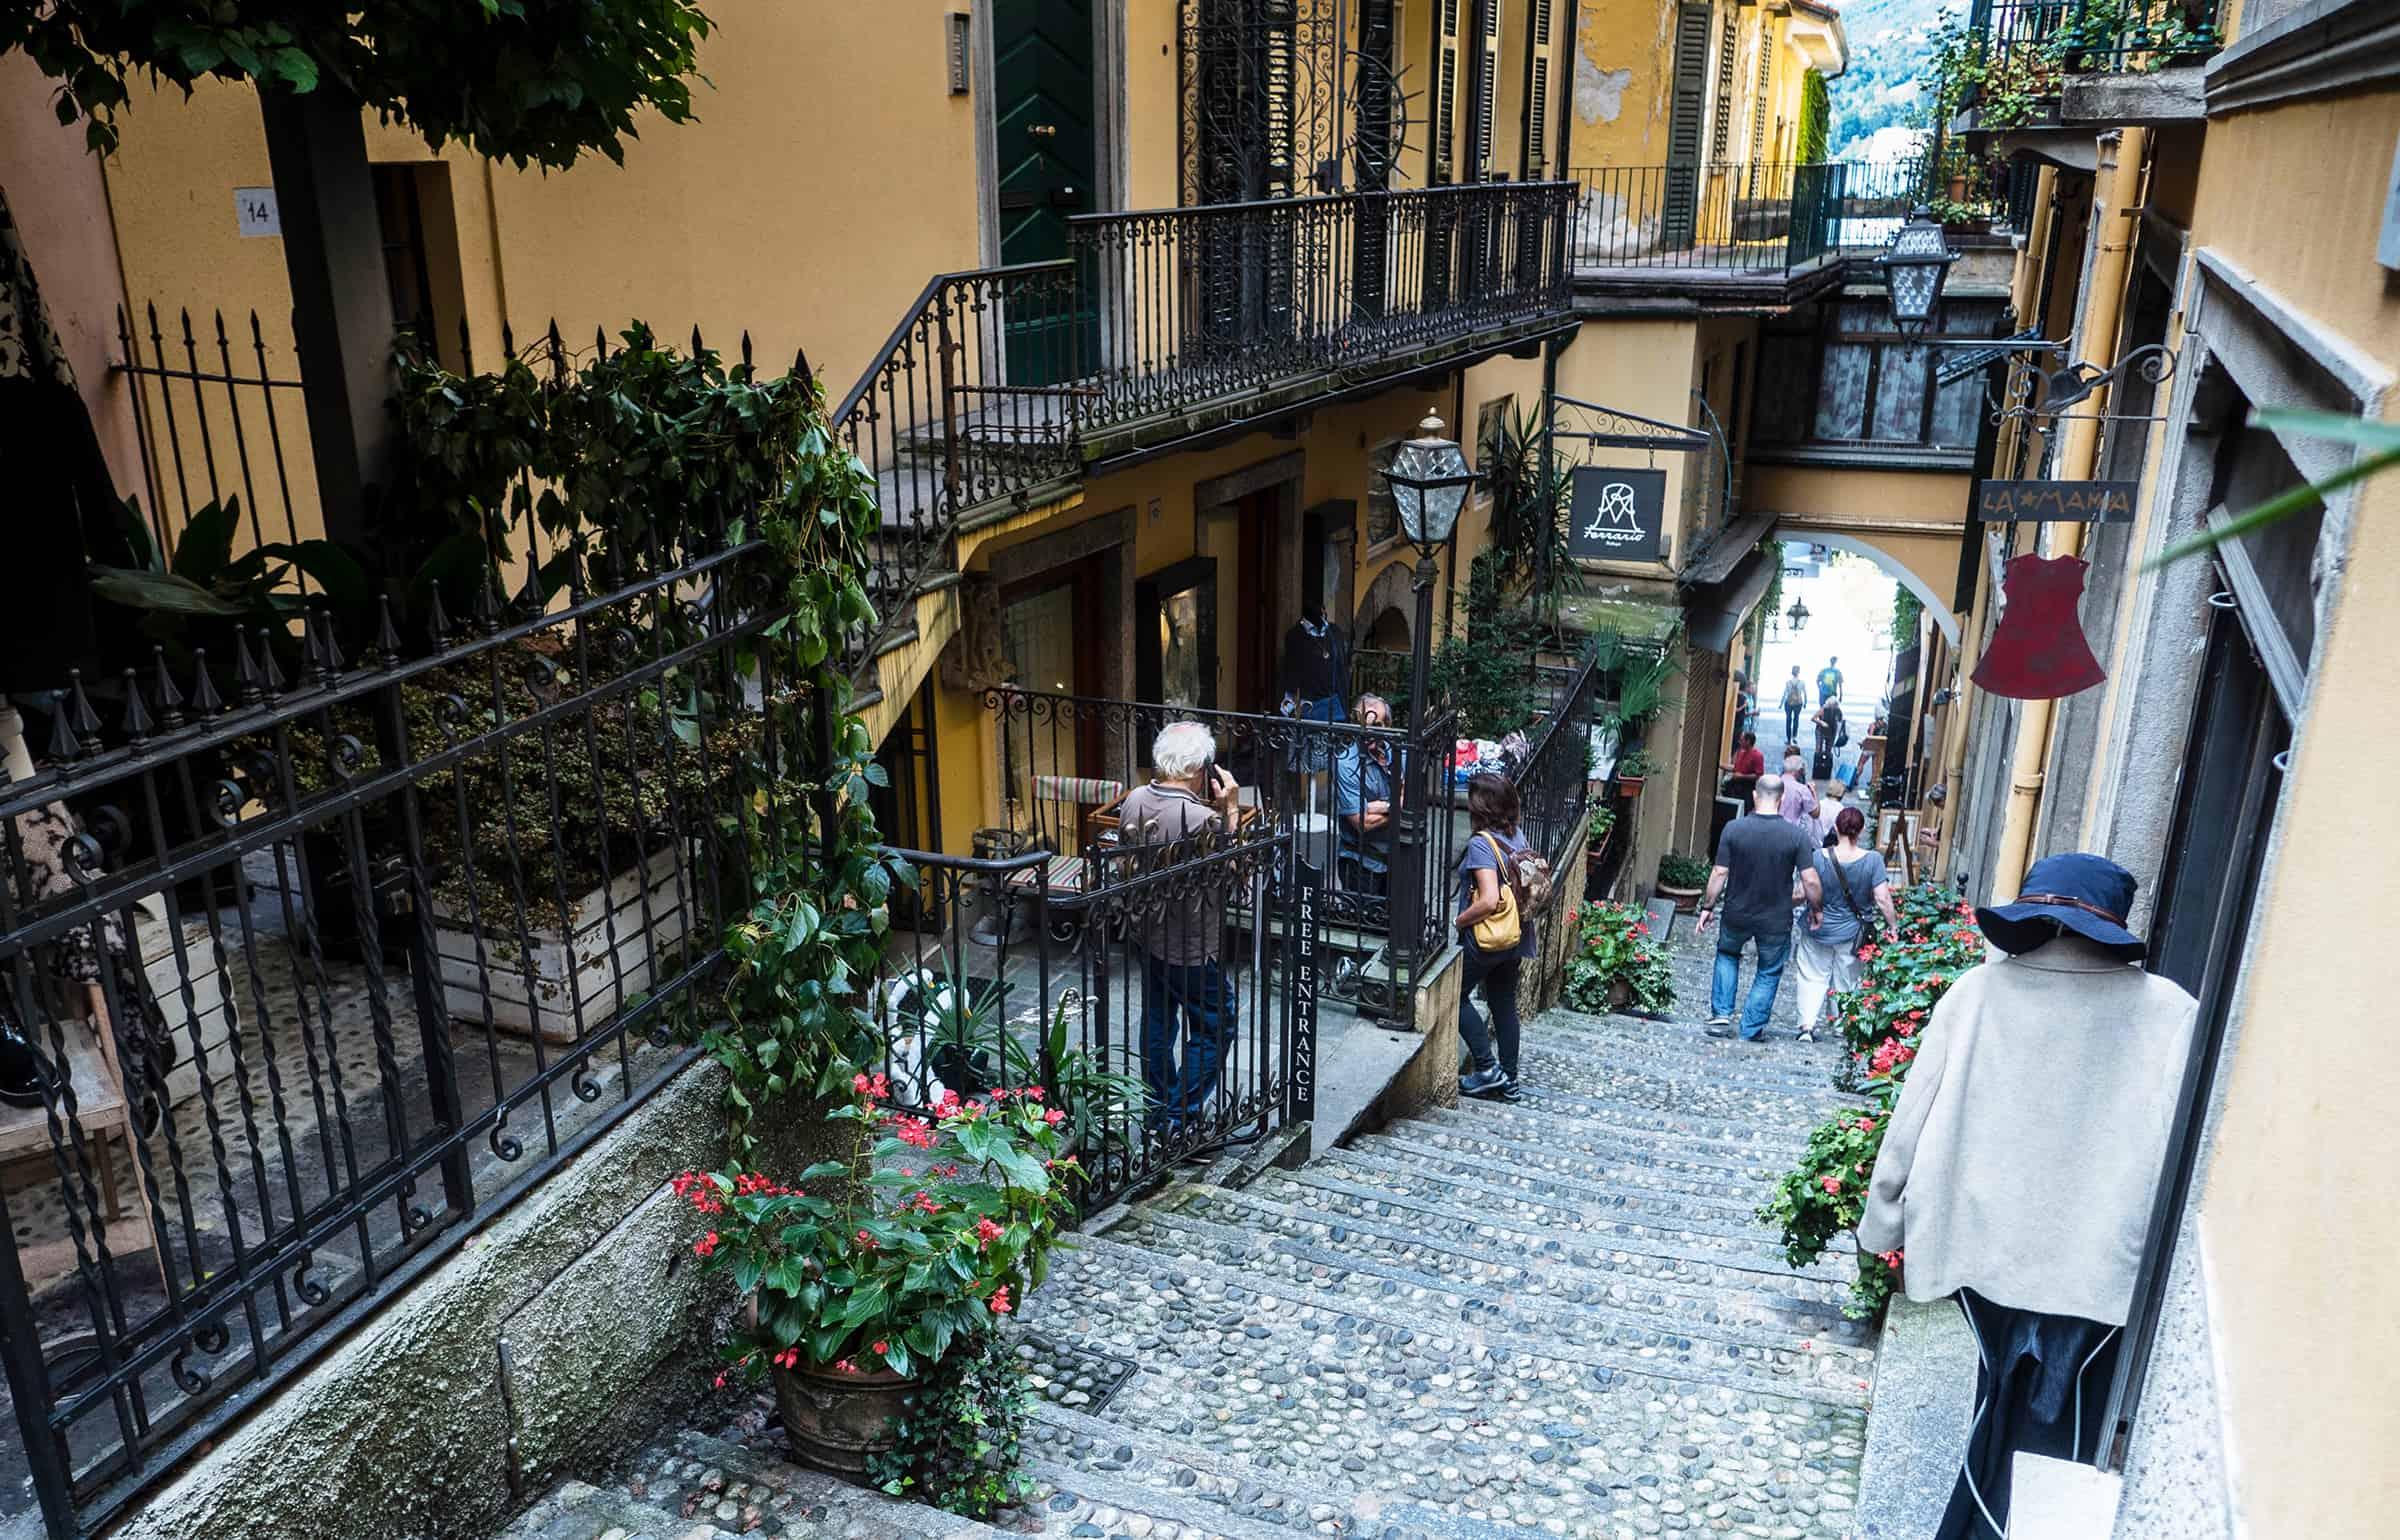 Het leuke dorp Bellagio 1